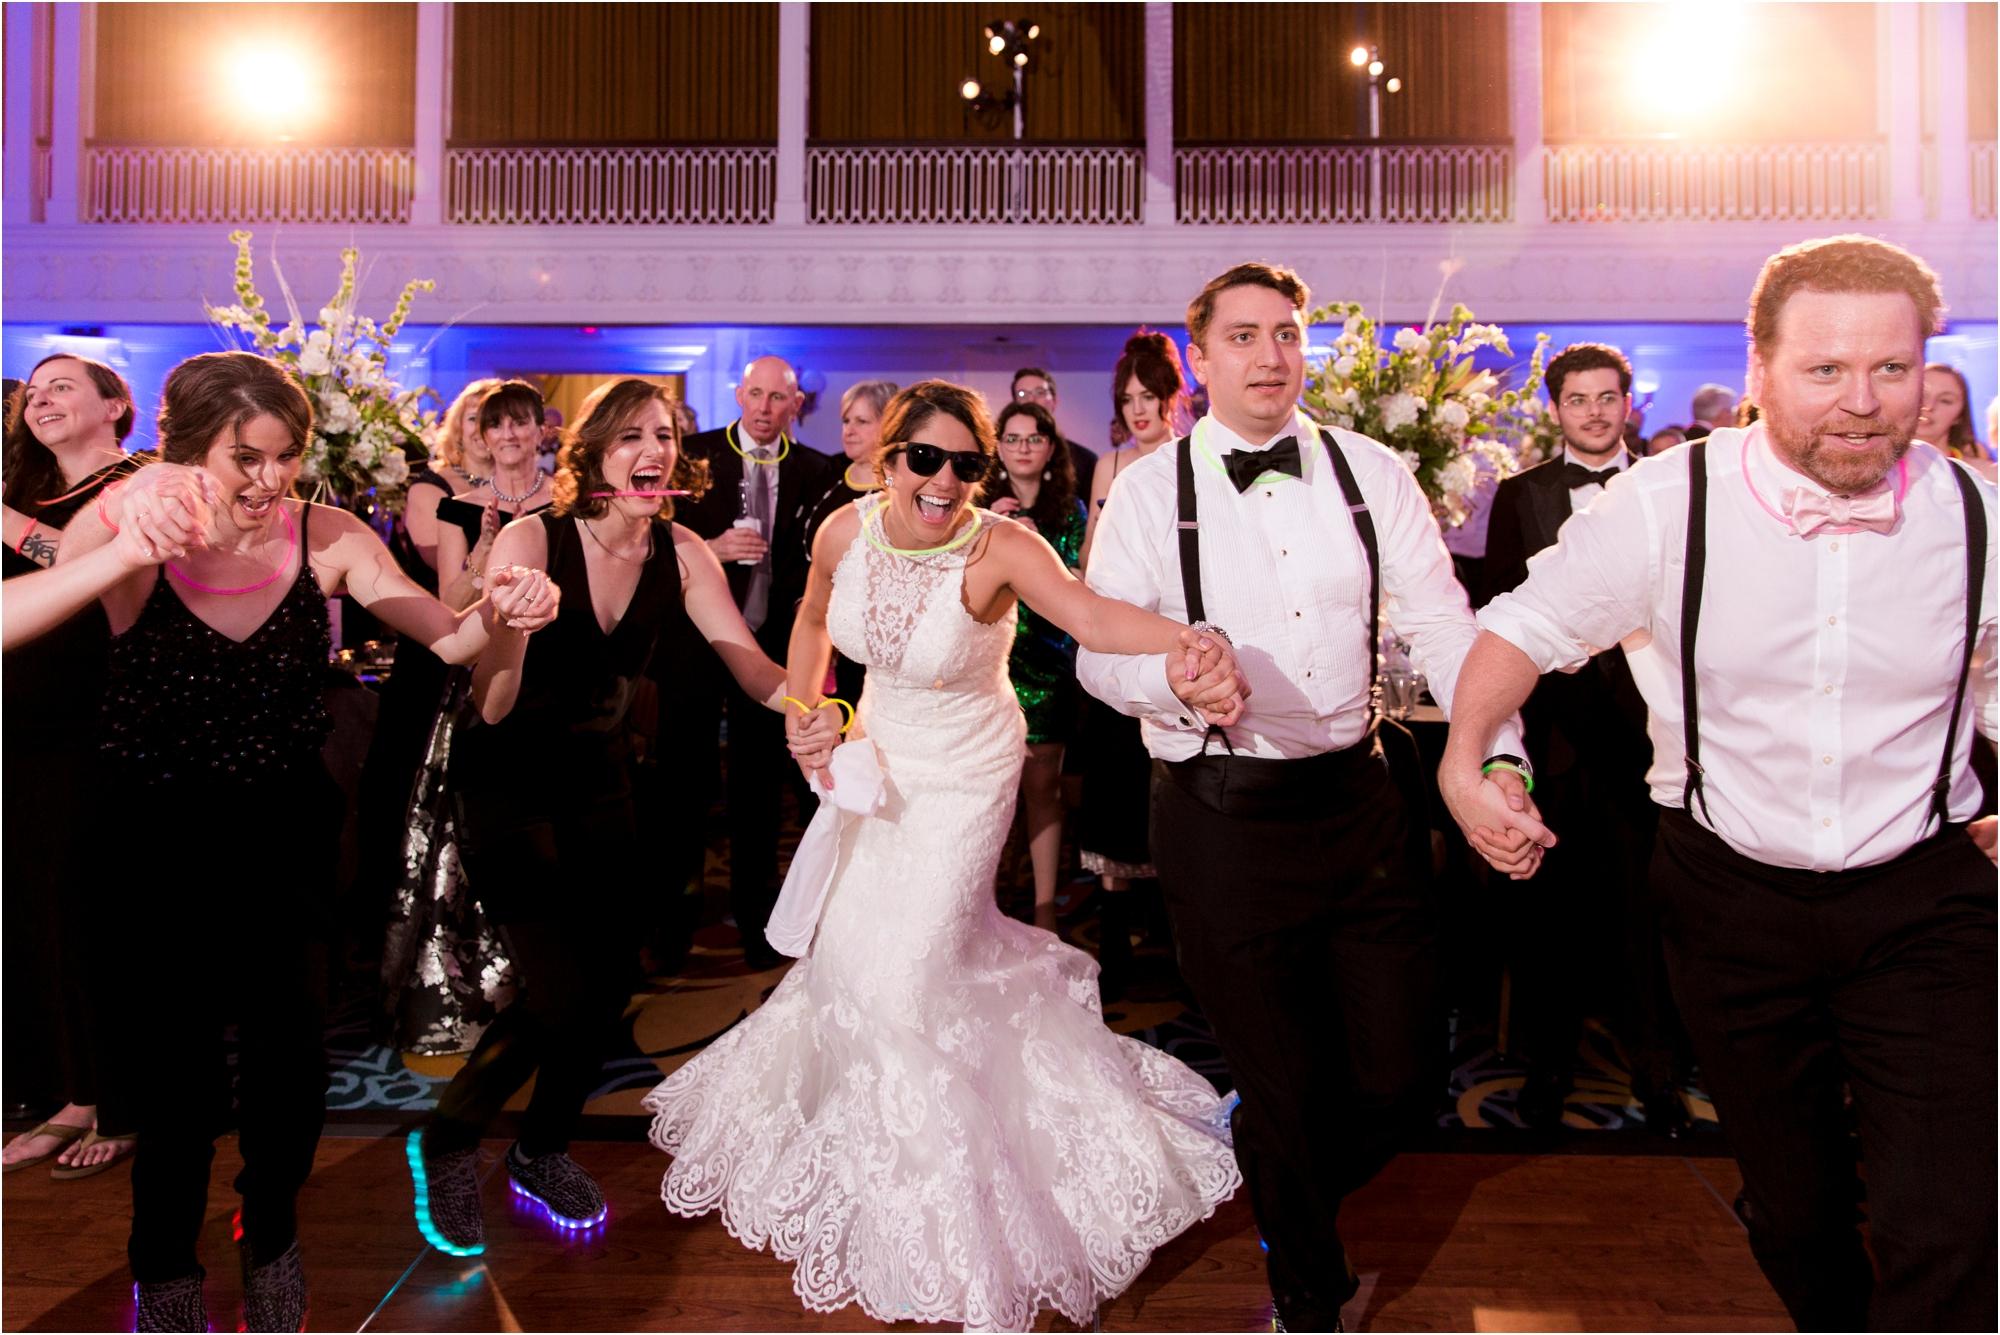 phoebe-mayme-richmond-virginia-colorful-love-is-love-wedding-photos_0054.jpg